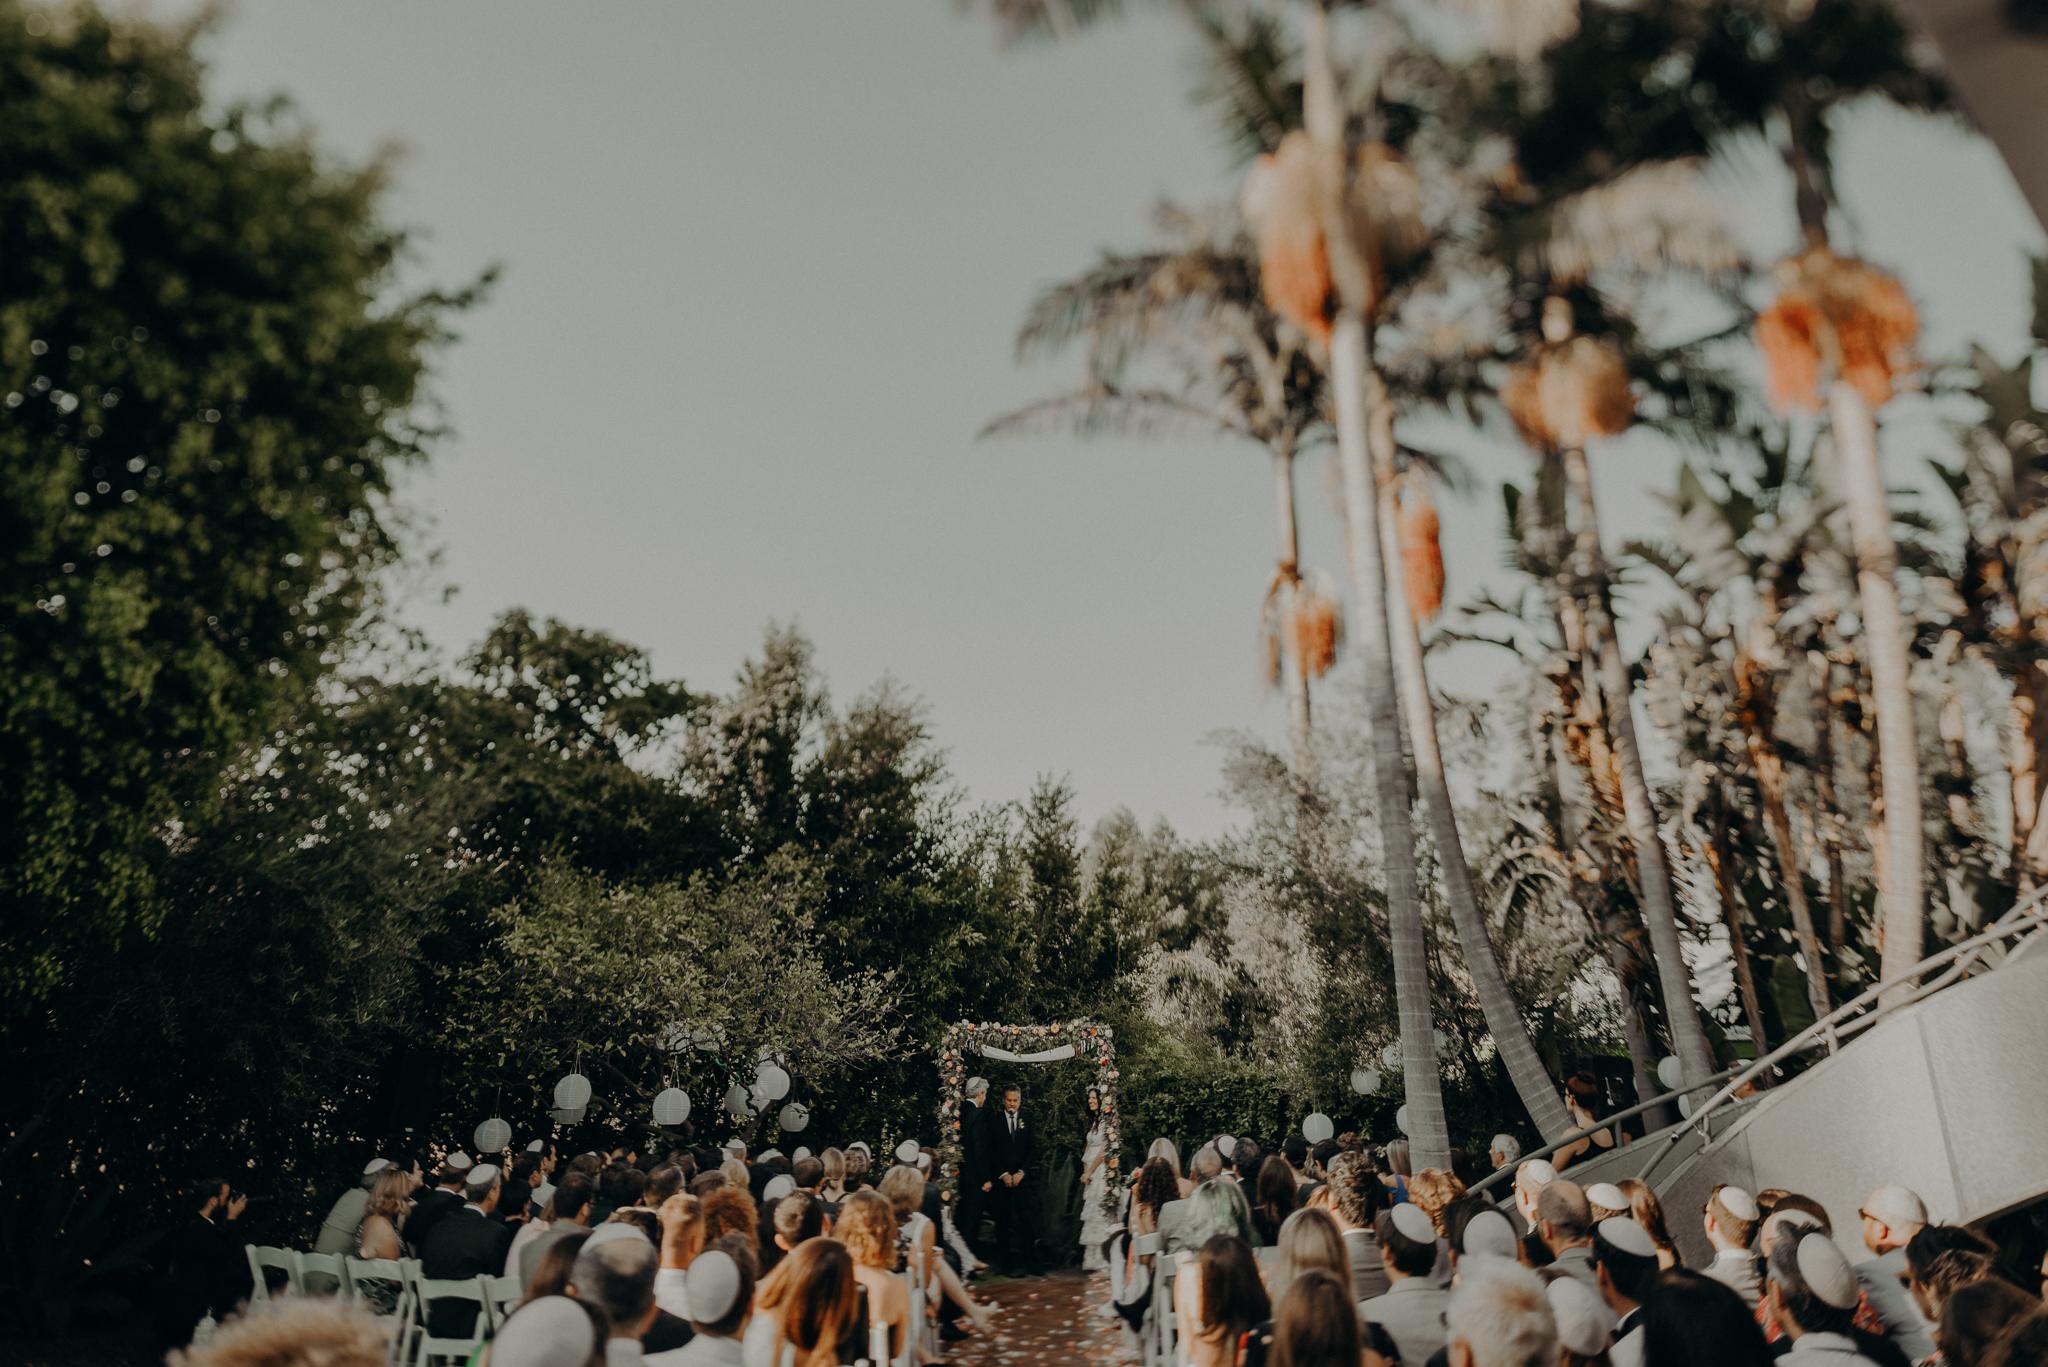 Isaiah+TaylorPhotography-PrivateEstateBackyardWedding-BeverlyHills-LosAngelesWeddingPhotographer-76.jpg